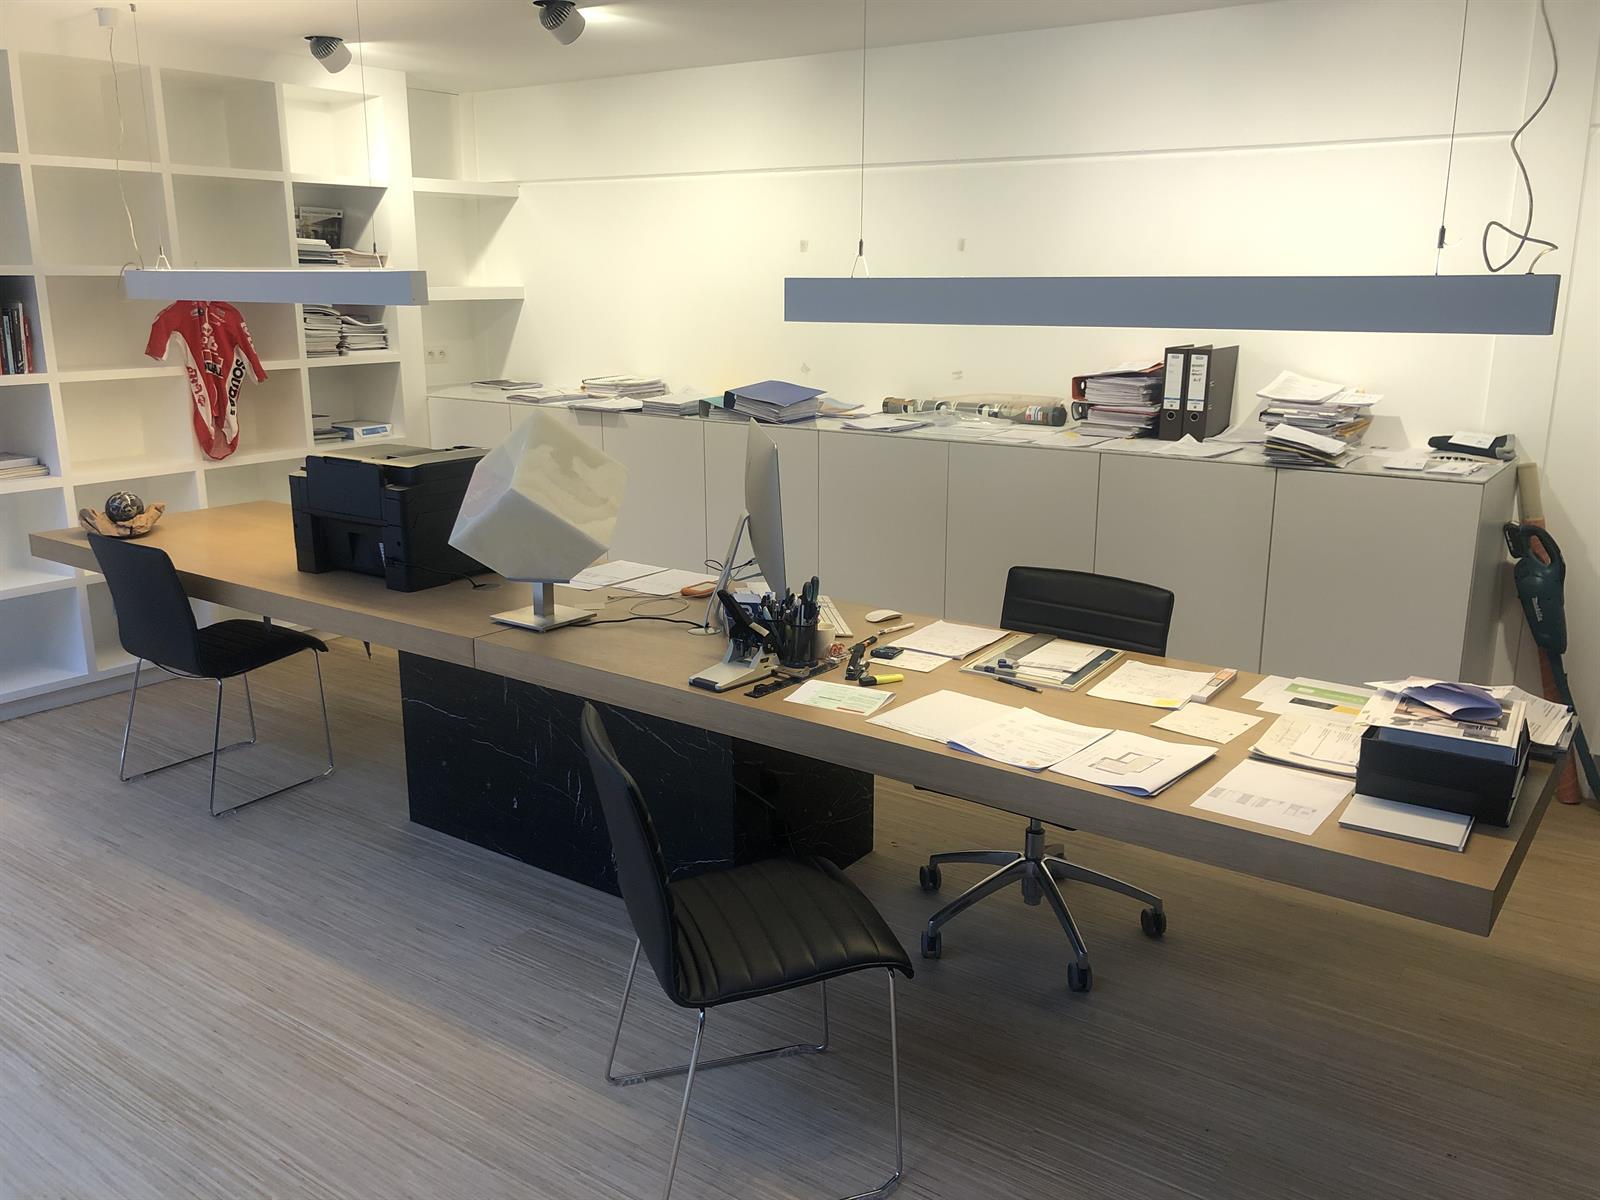 KMO-unit te koop I124 - KMO-Unit - Schoenstraat 11 K, 9140 Temse, België 9